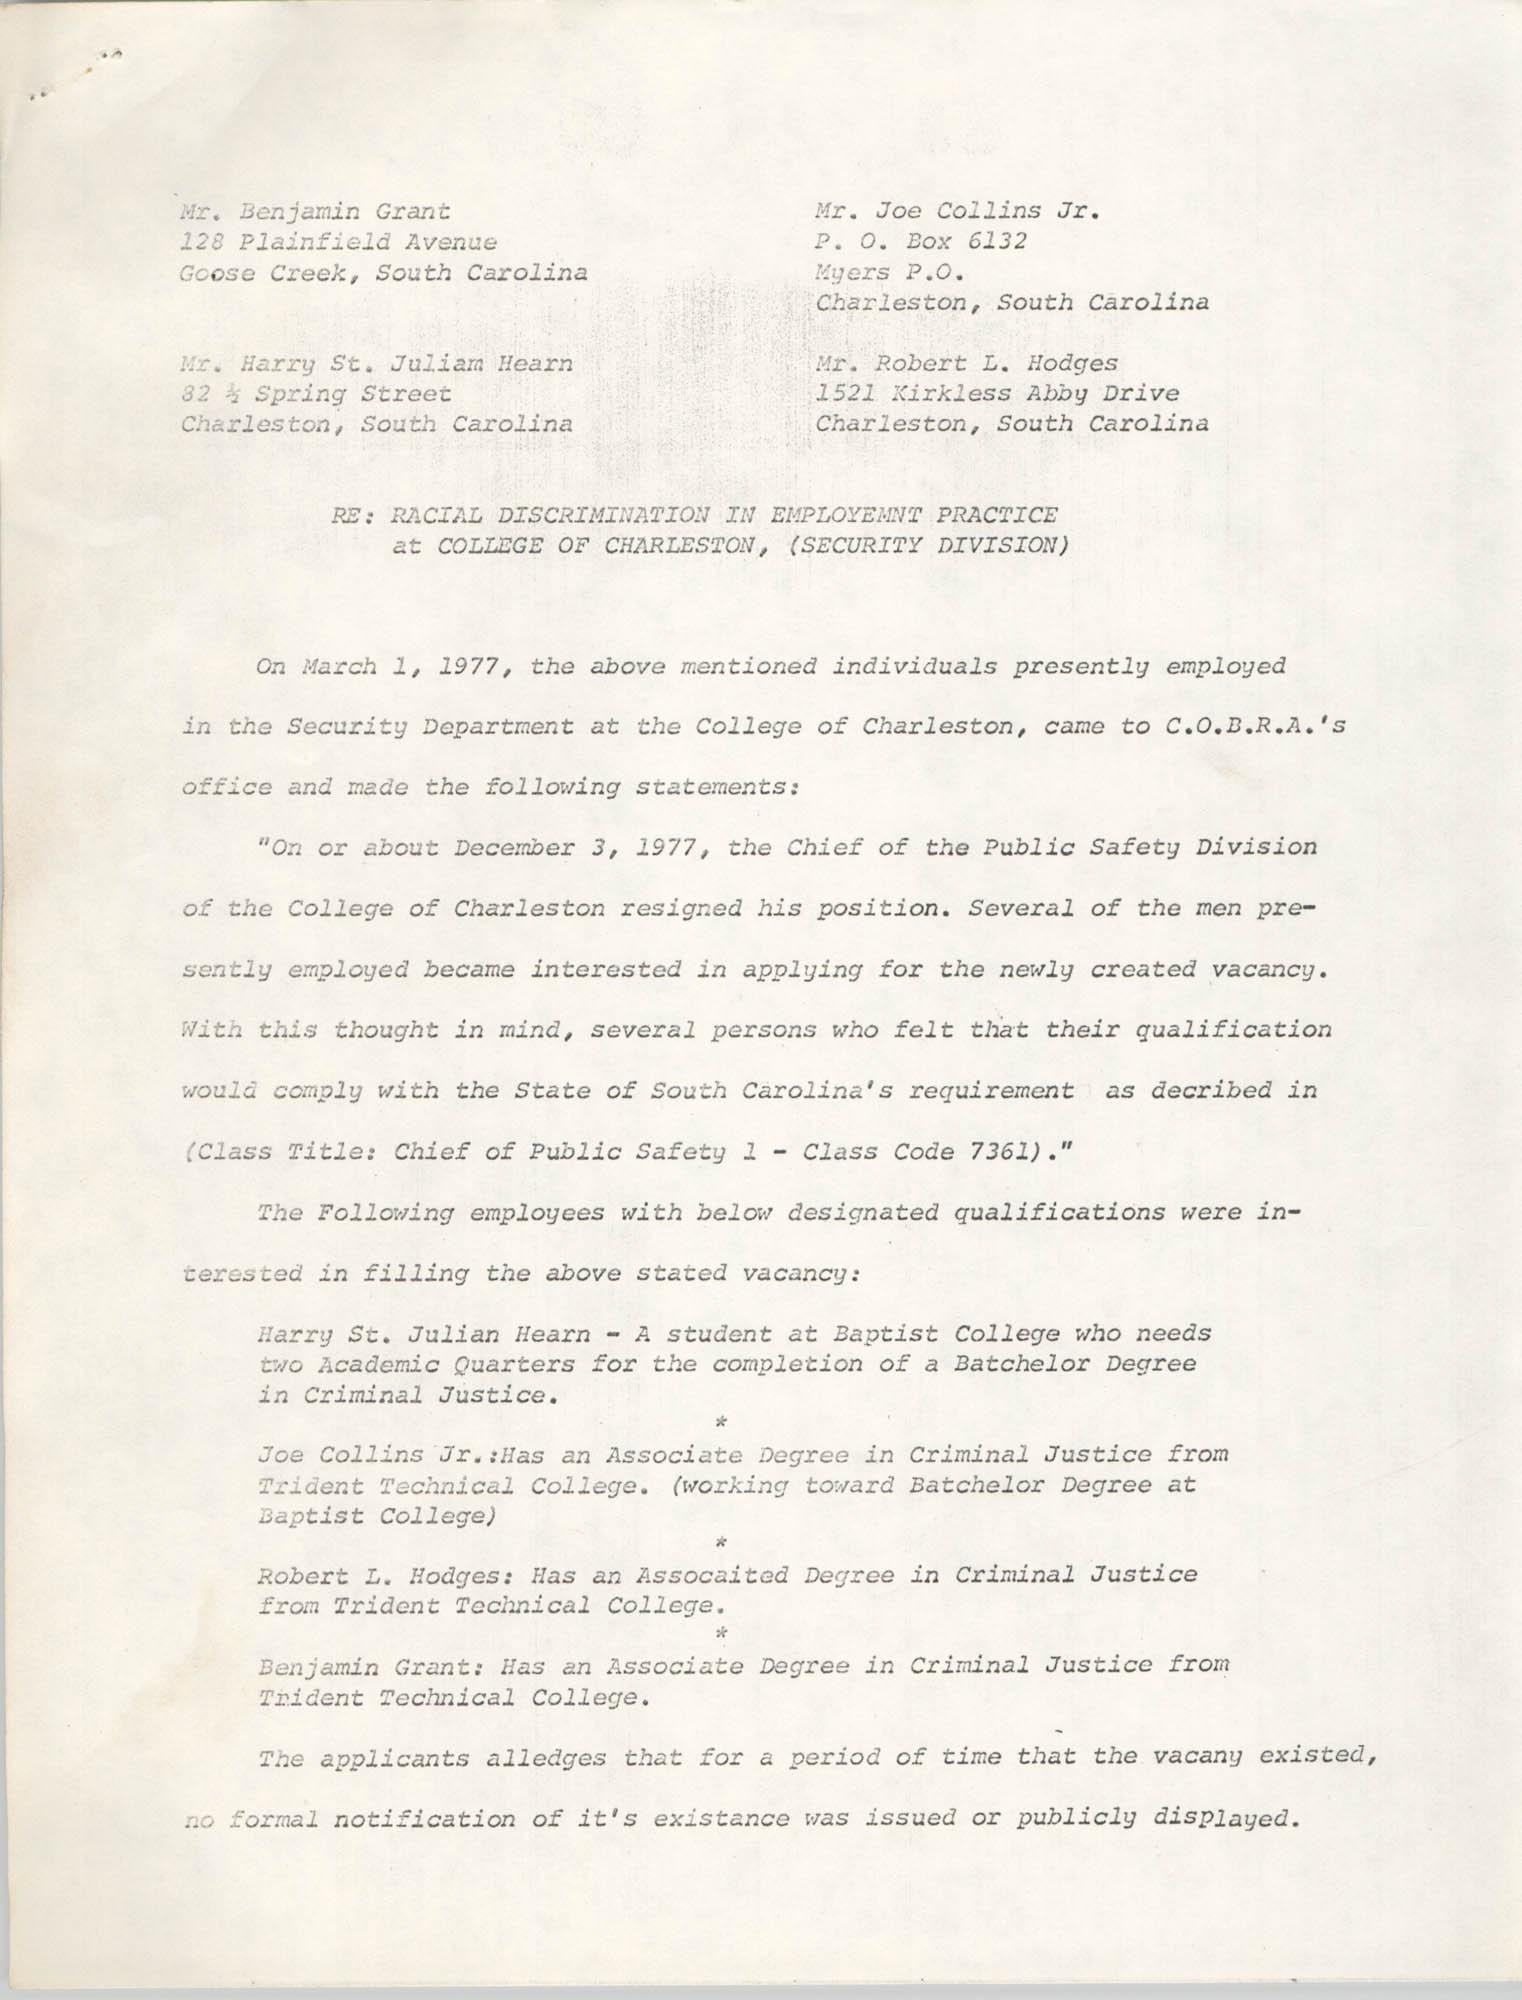 COBRA Statement, March 1, 1977